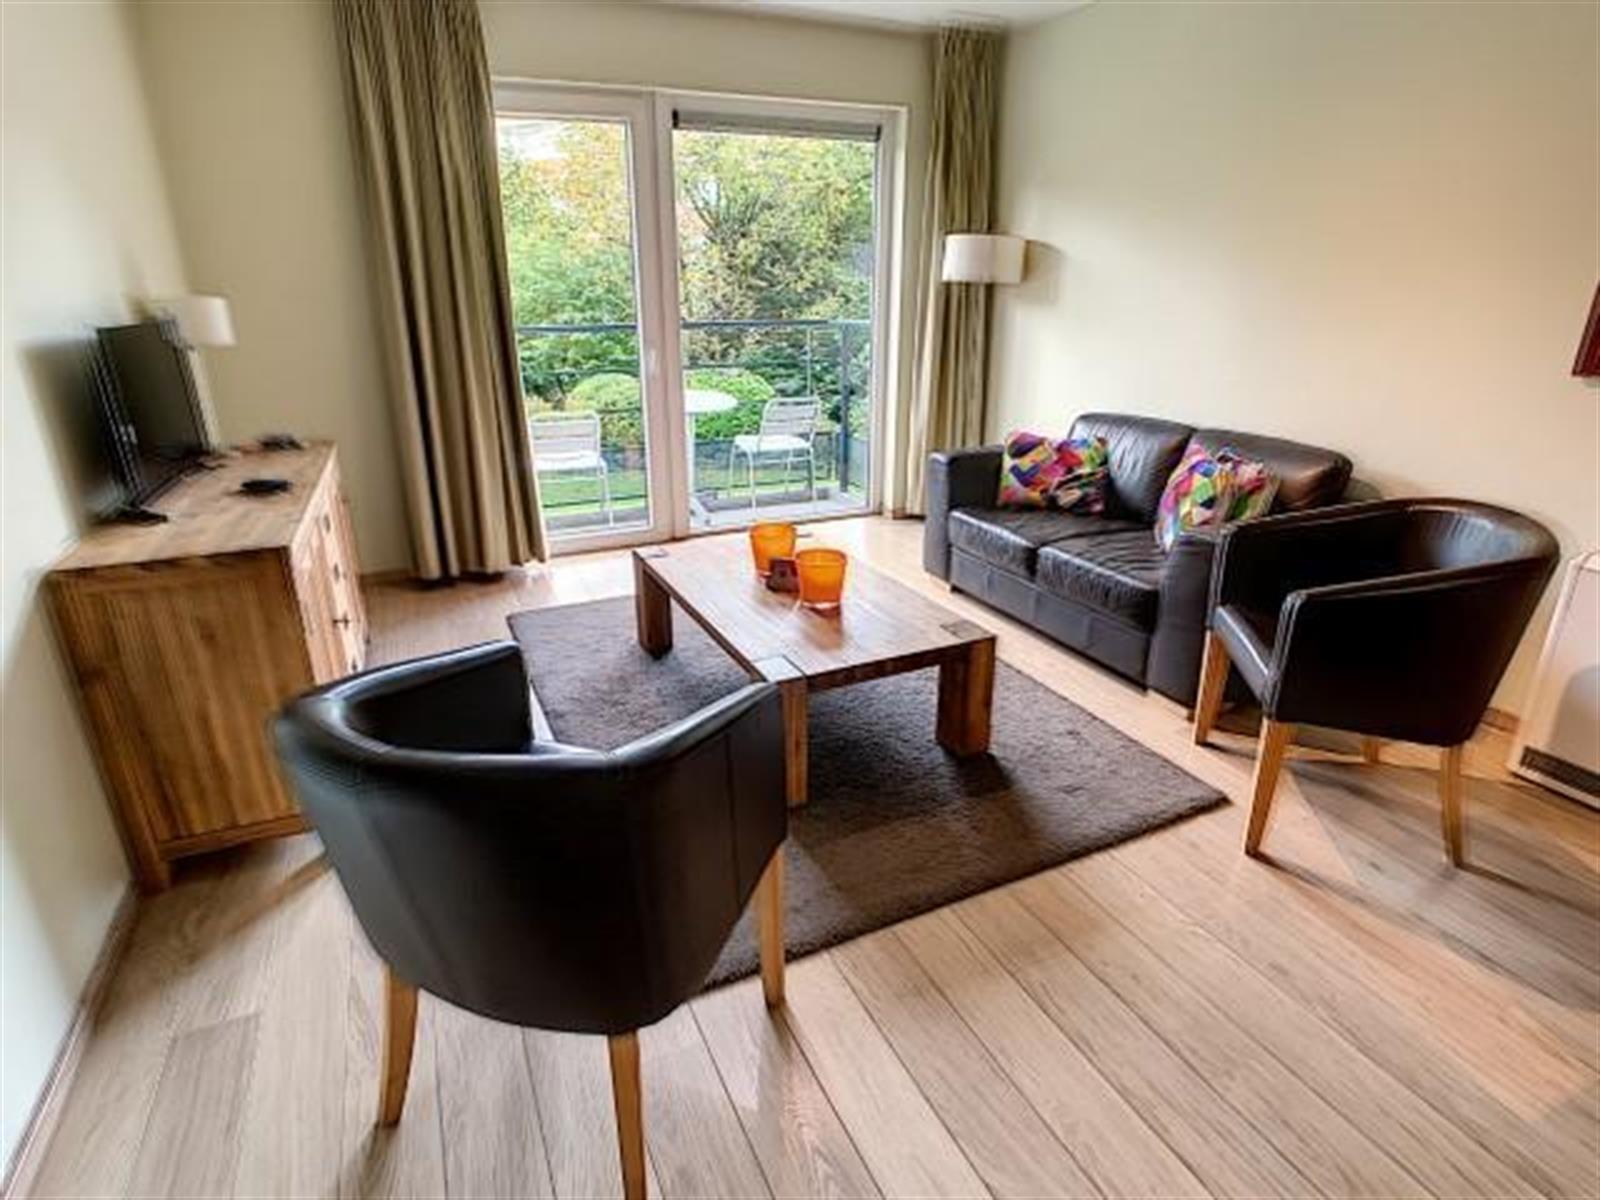 Appartement - Woluwe-Saint-Lambert - #4147227-2